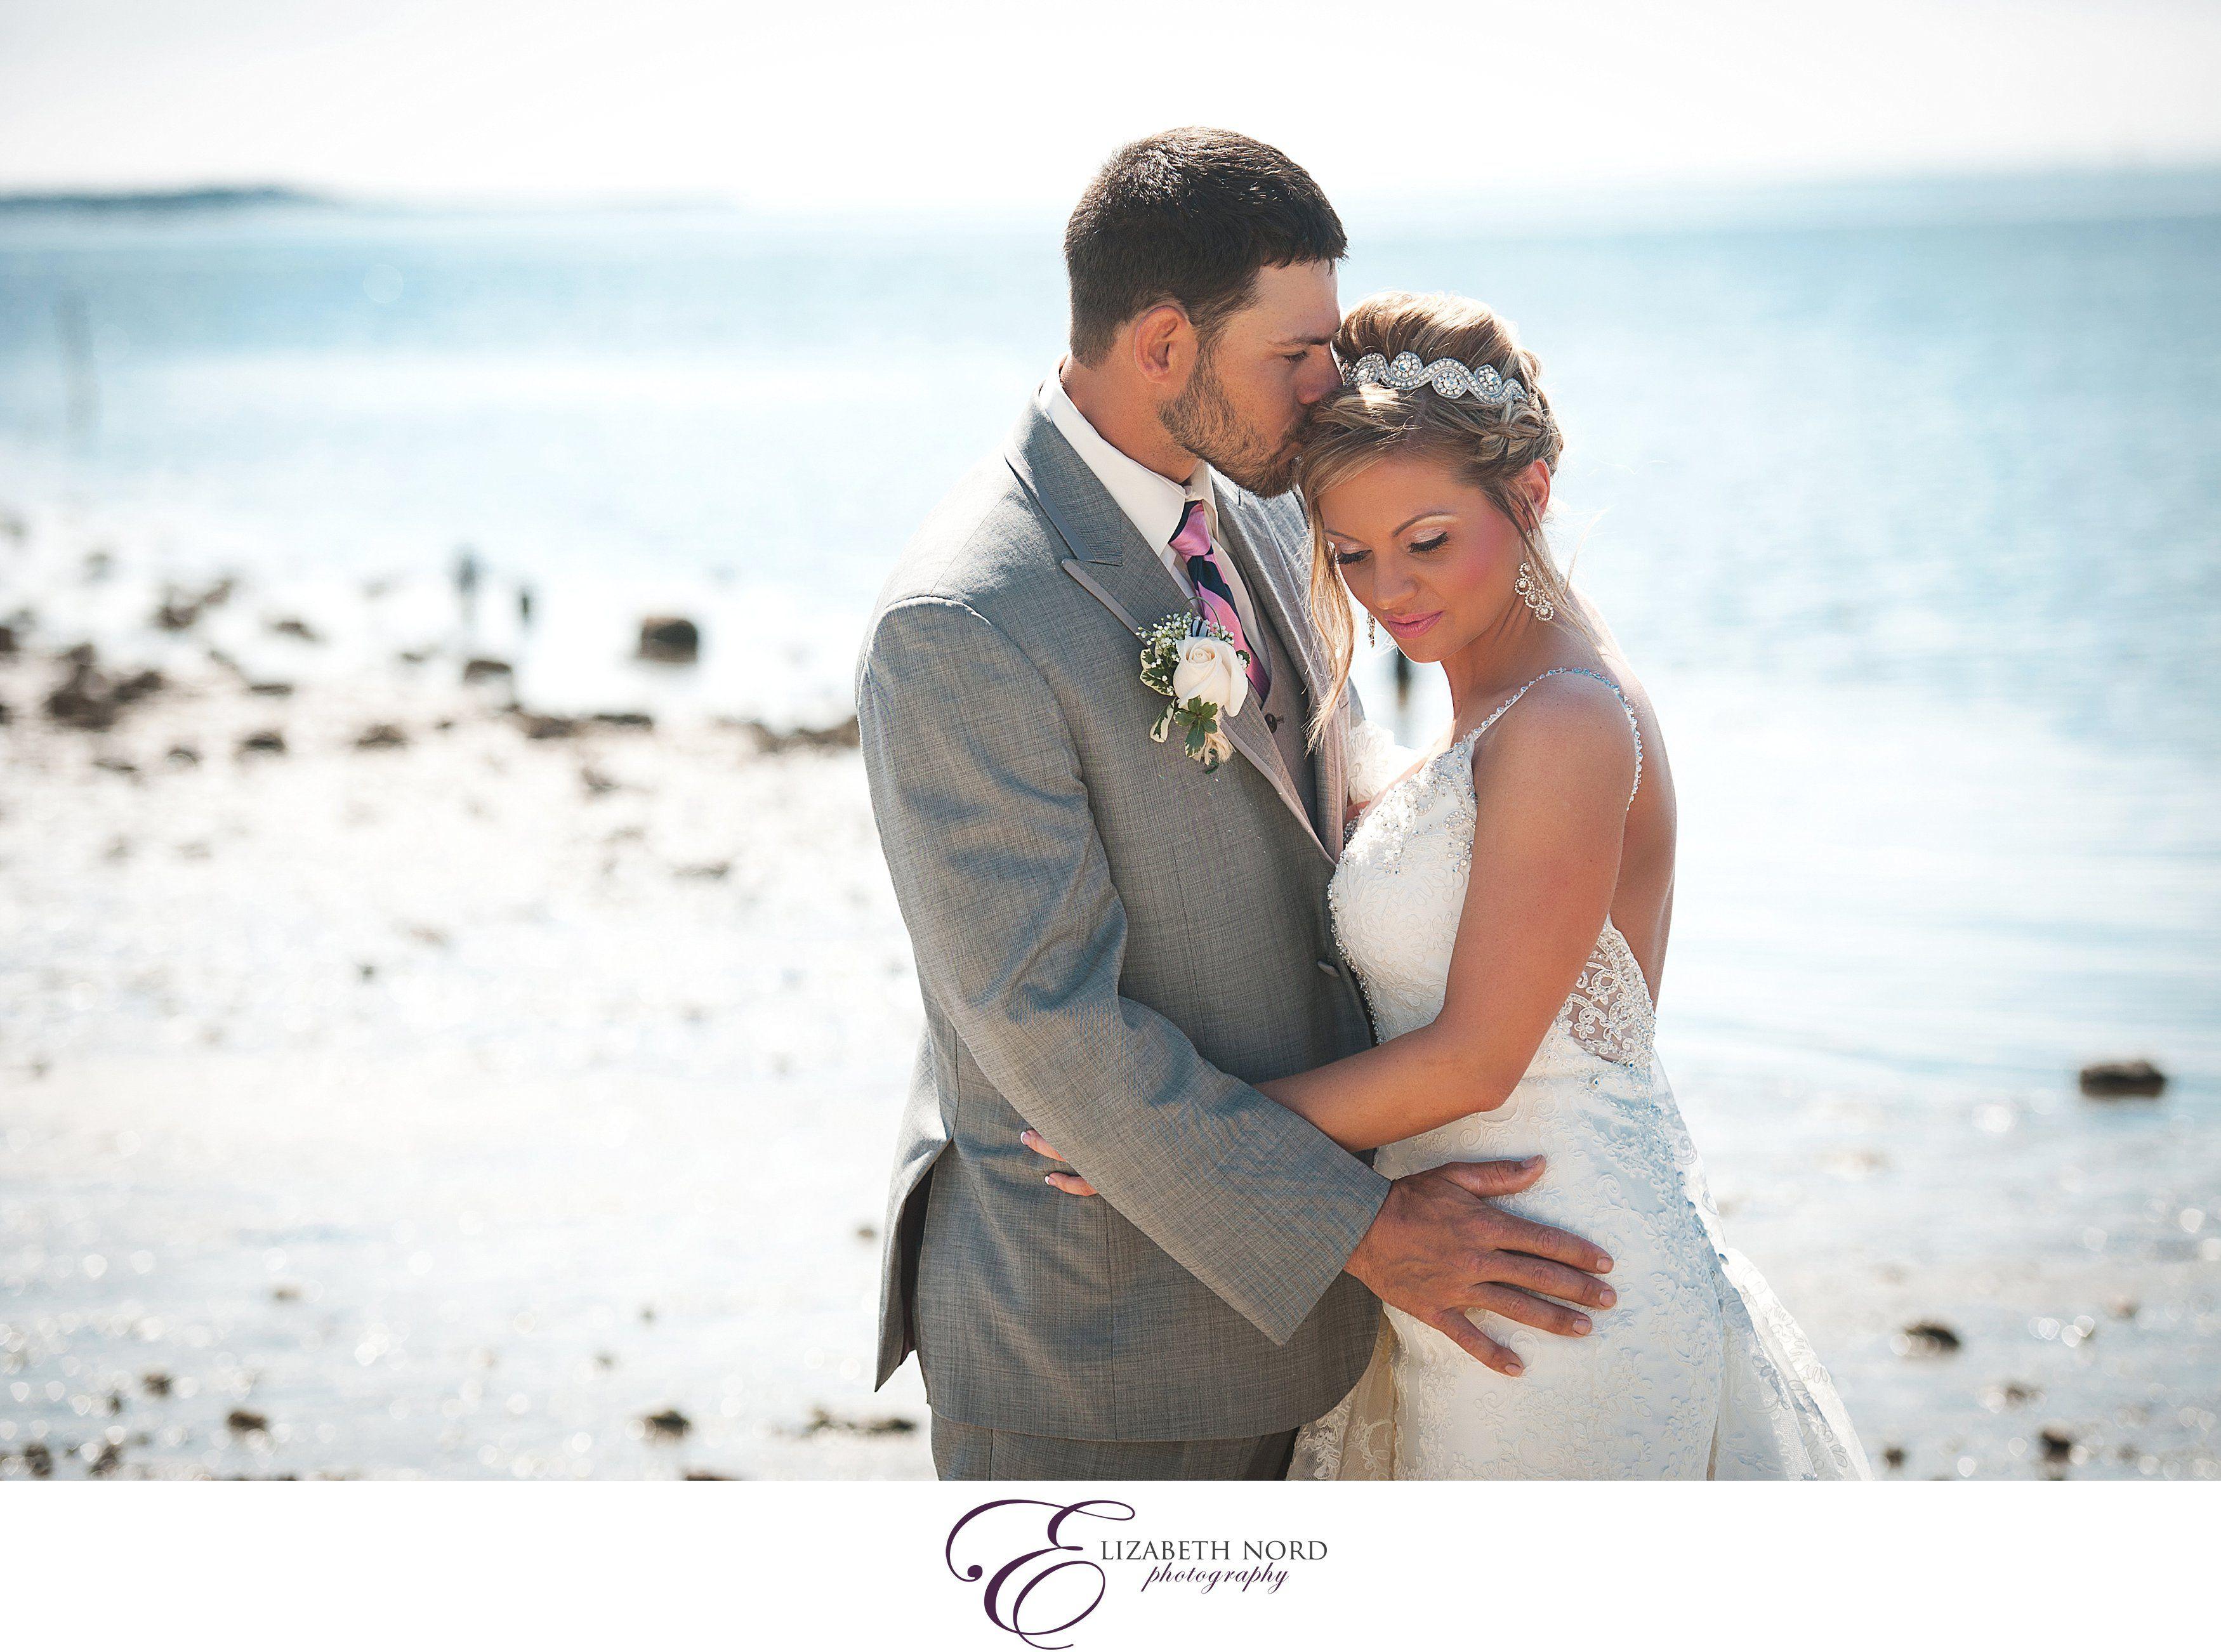 Elizabeth Nord Photography Destination Wedding In Cedar Key Fl Bride And Groom